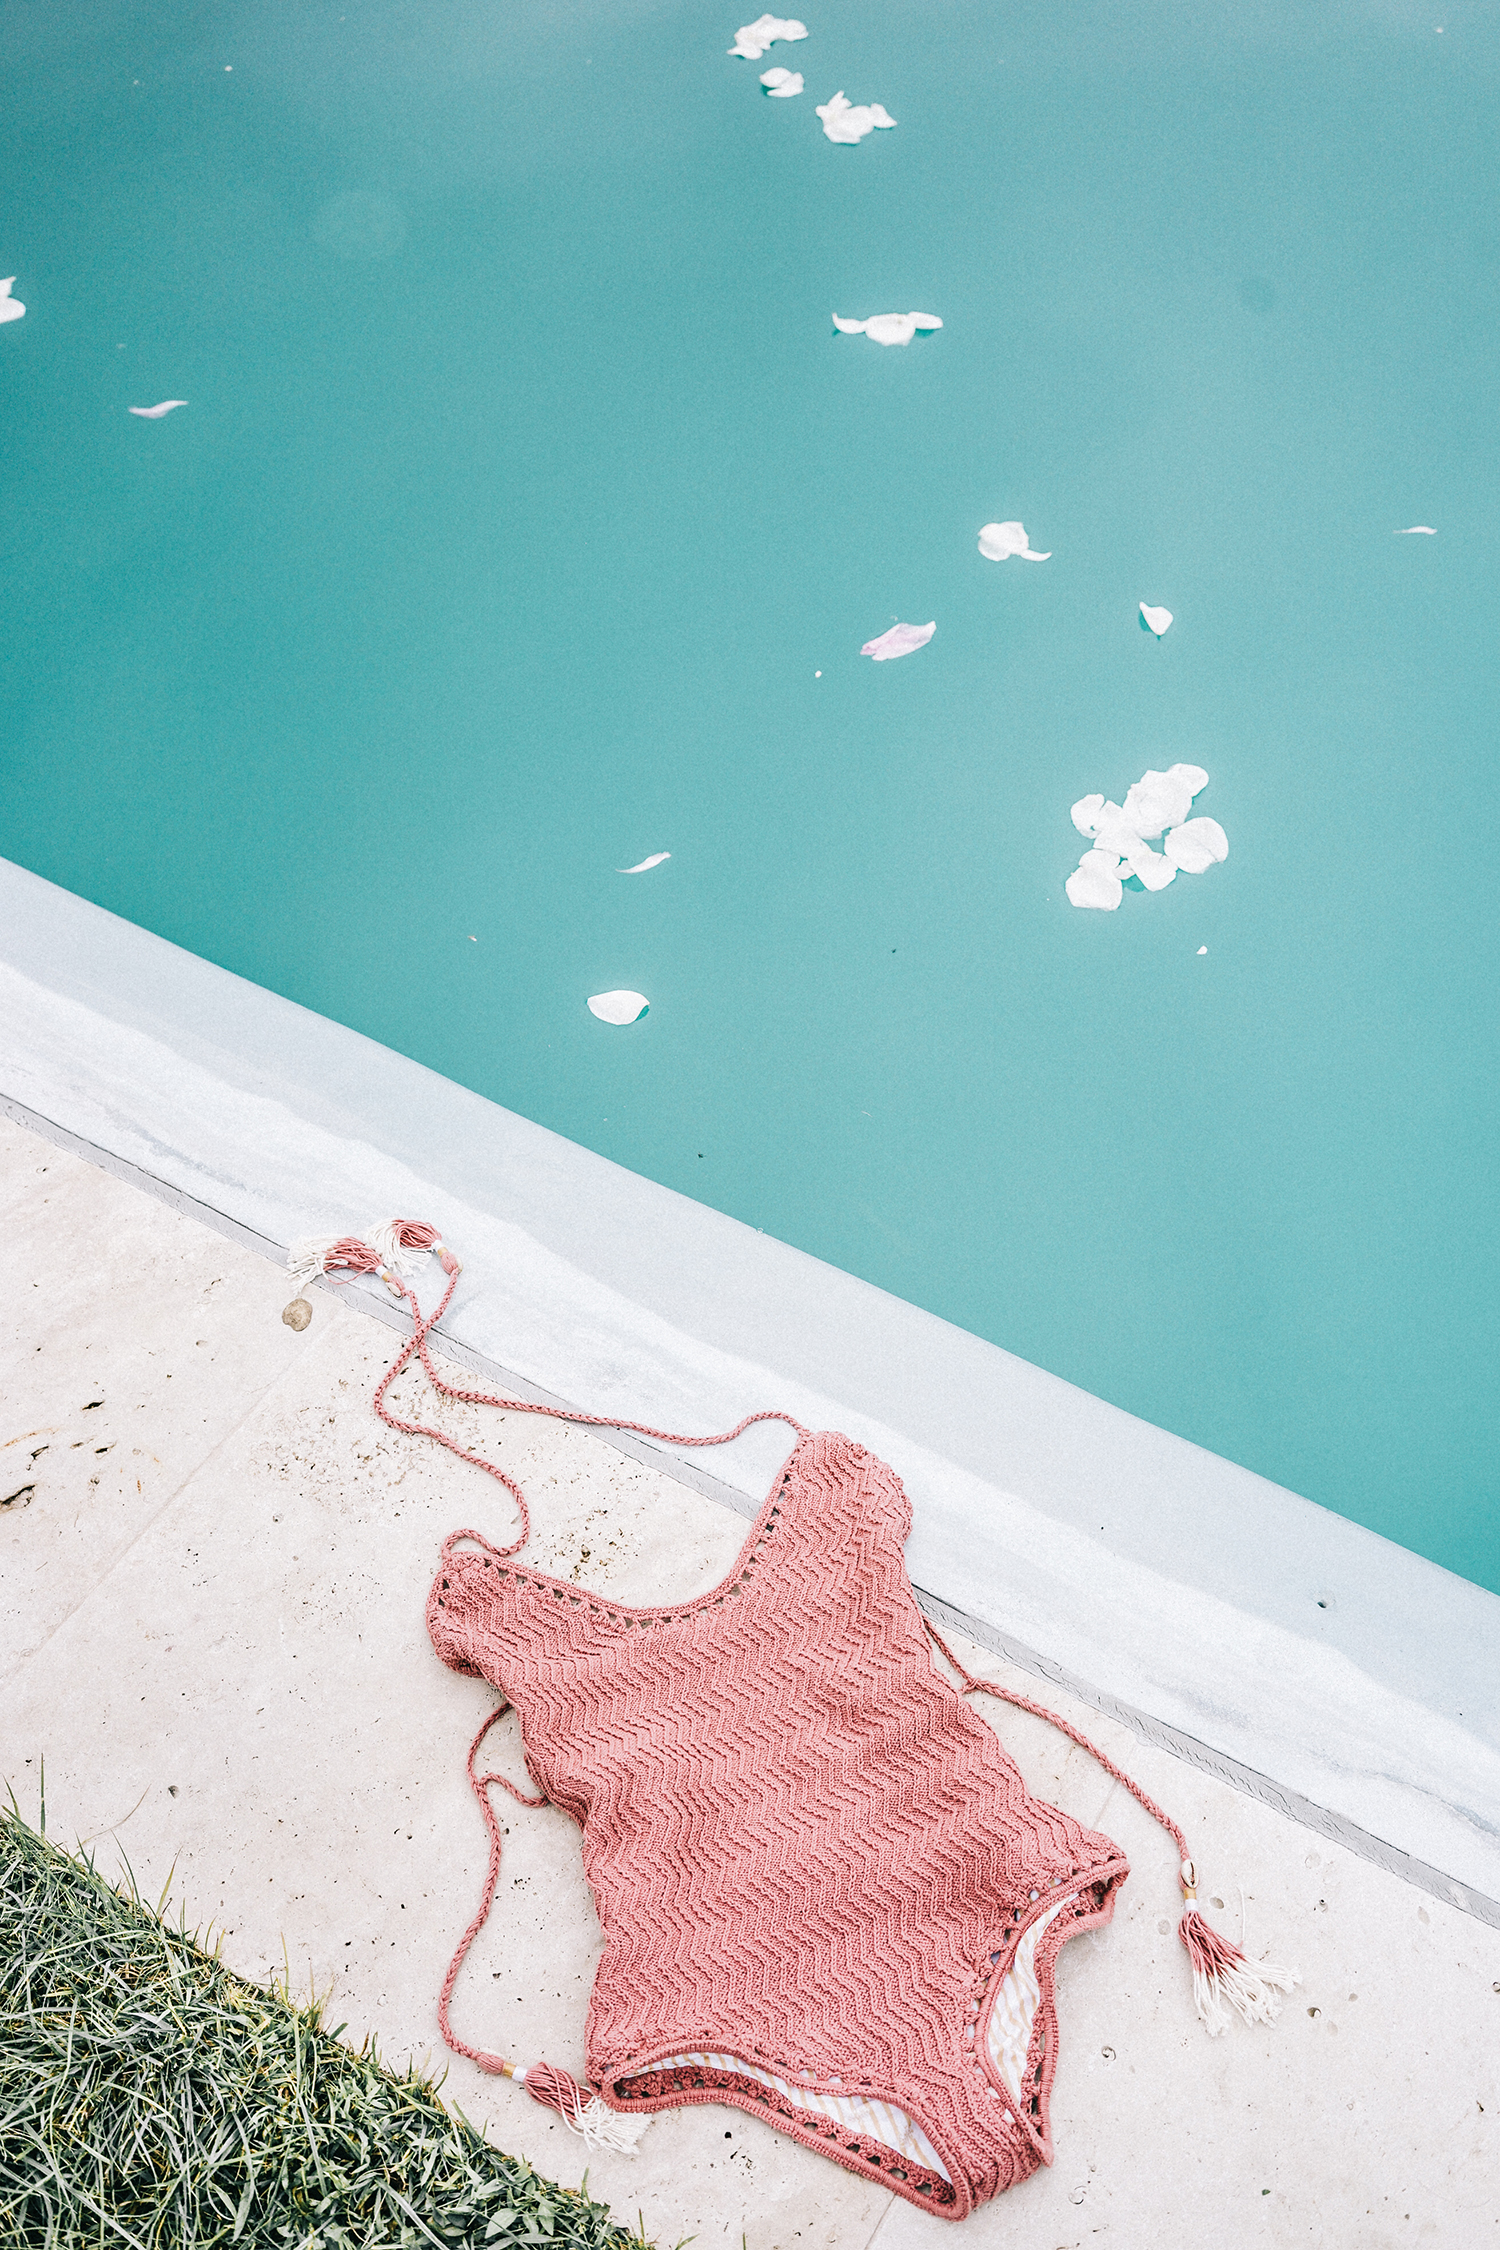 GRLFRND_Revolve_in_The_Hamptons-Denim_Skirt-Outfit-Collage_Vintage-47